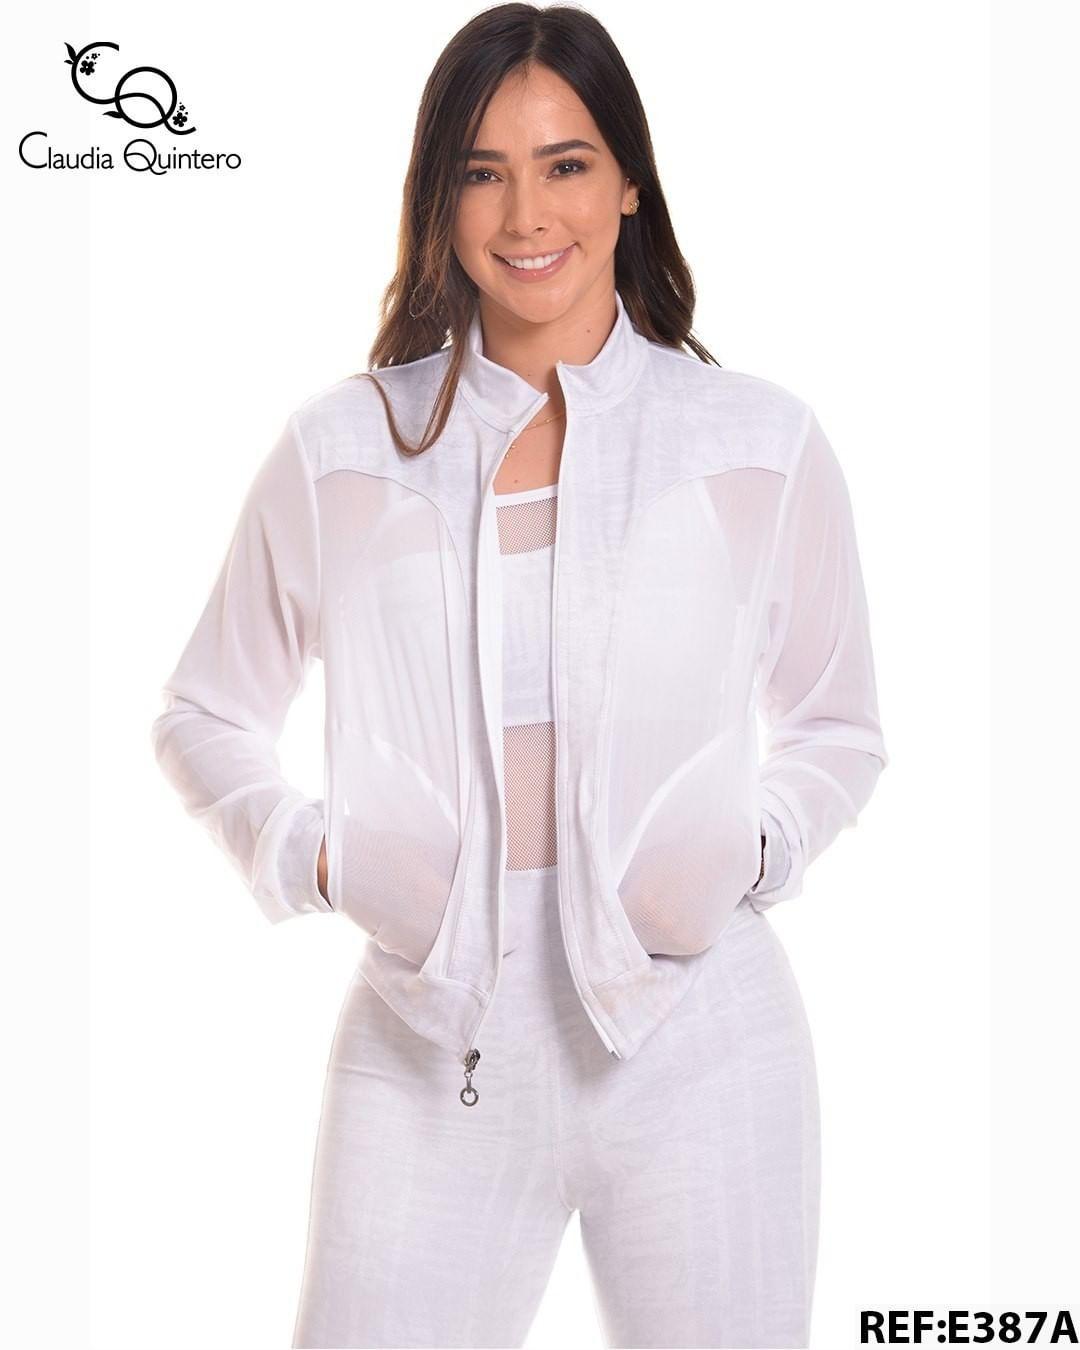 white lookbook dress with formal wear, uniform, blazer